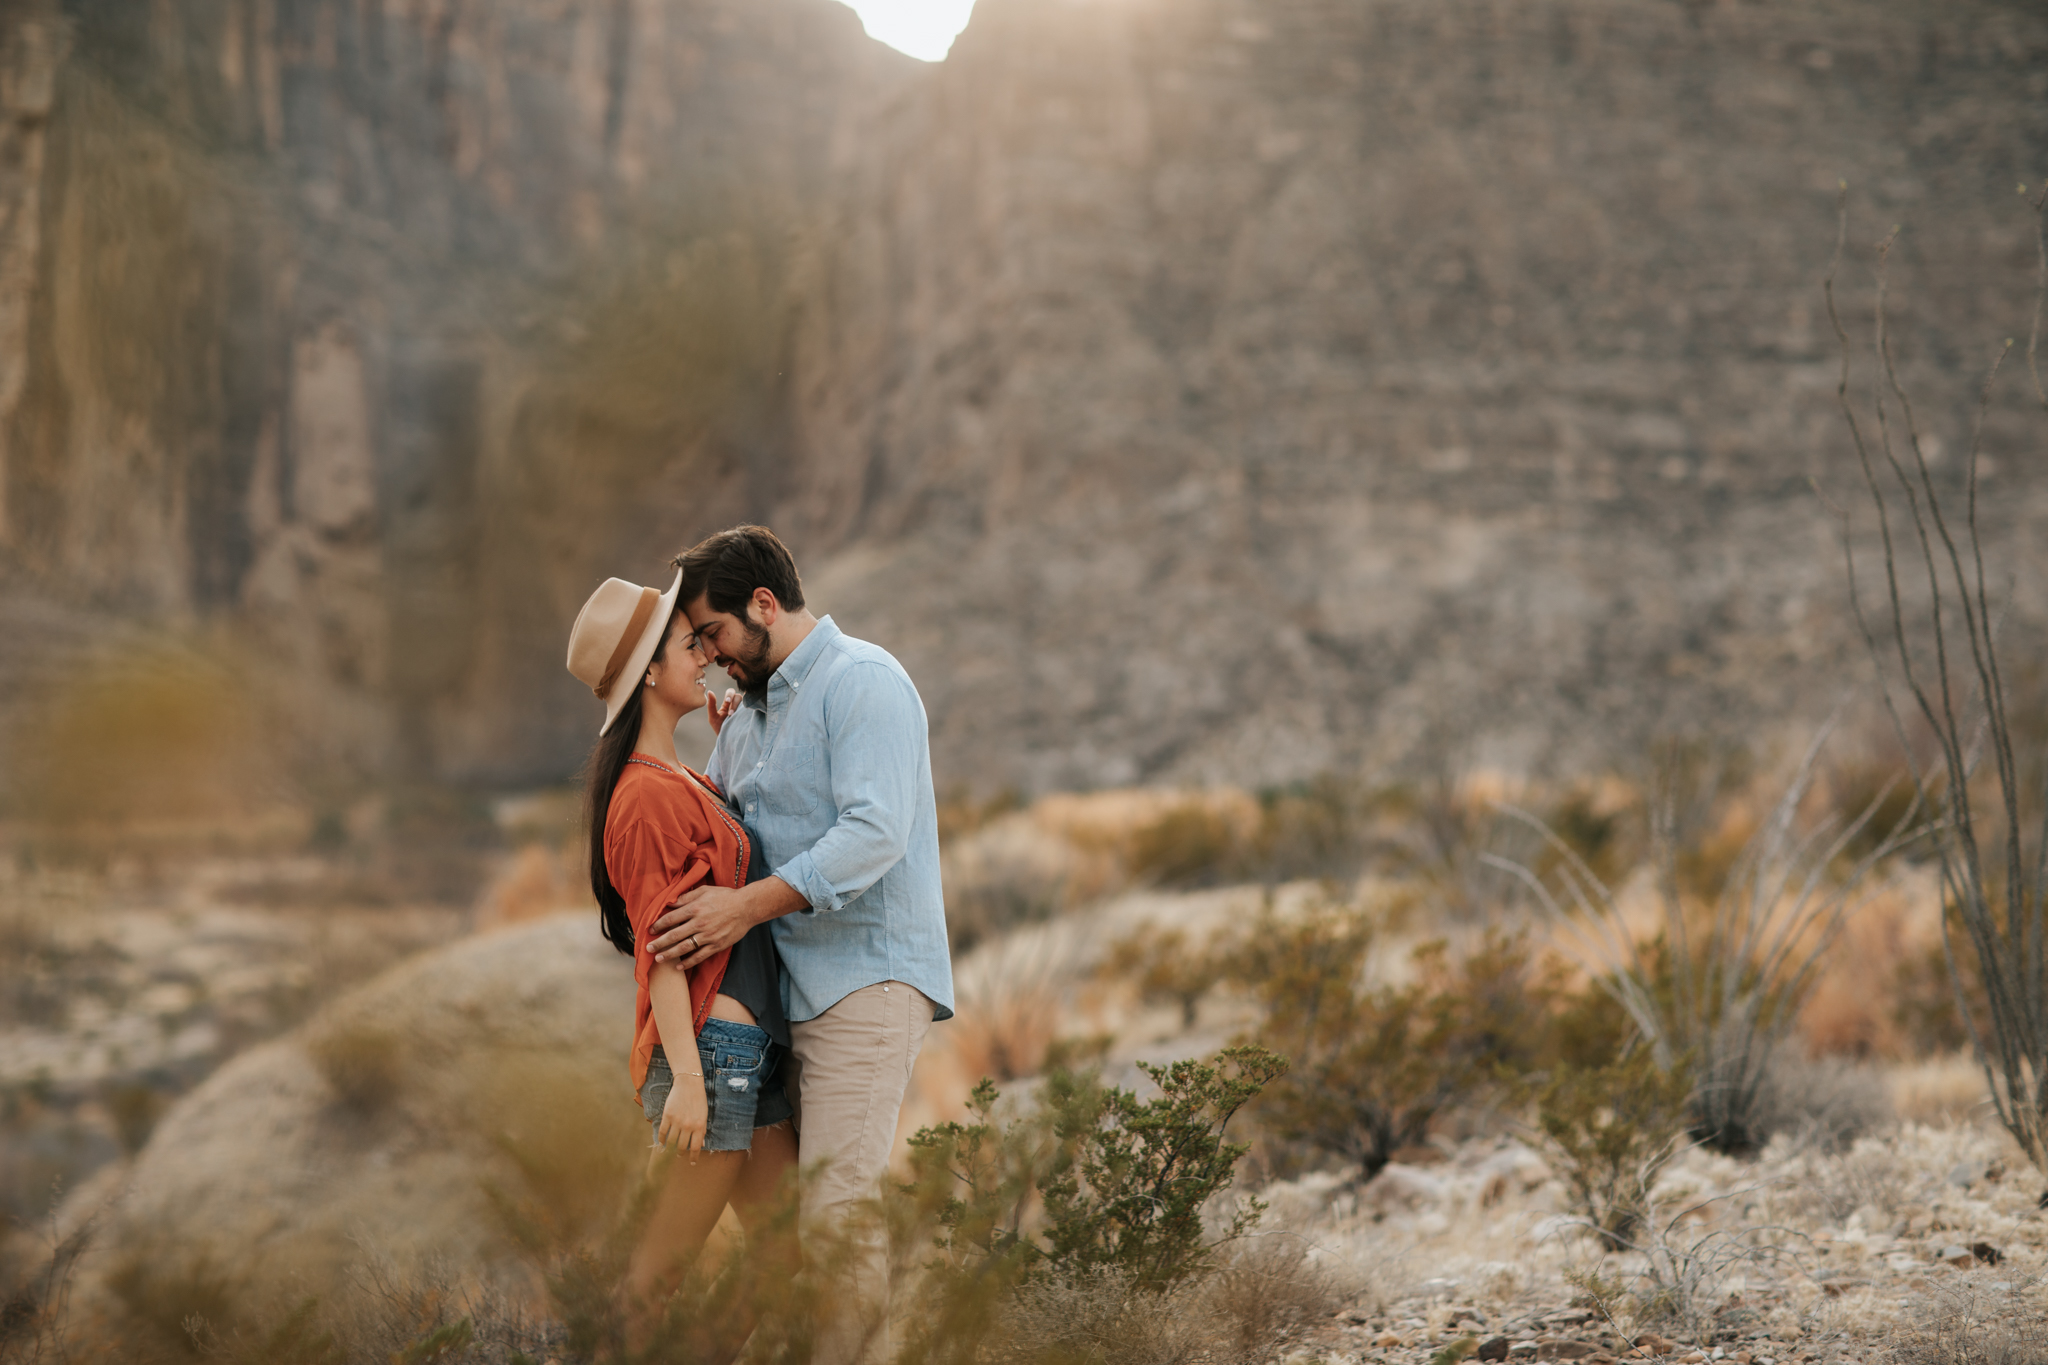 big-bend-elopement-intimate-adventure-wedding-texas-photographer-nature-colorado-90.jpg